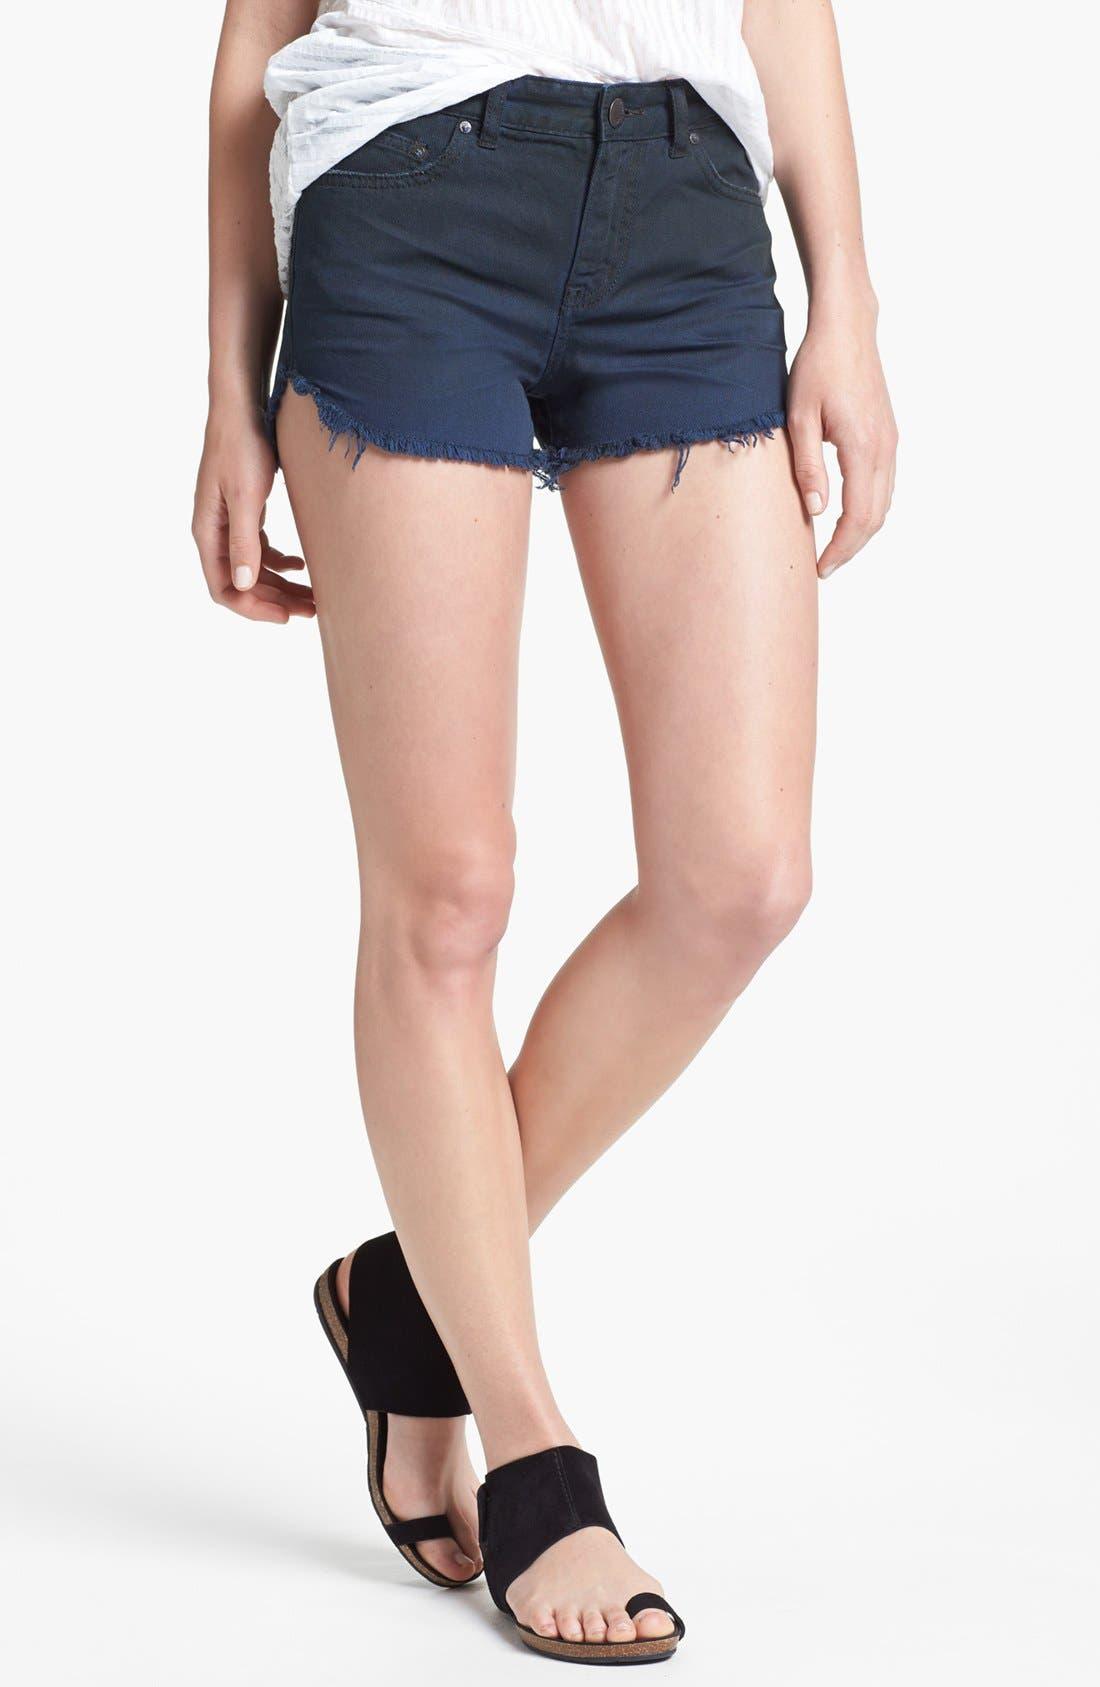 Alternate Image 1 Selected - Free People 'Dolphin' Cutoff Denim Shorts (Blue/Black)